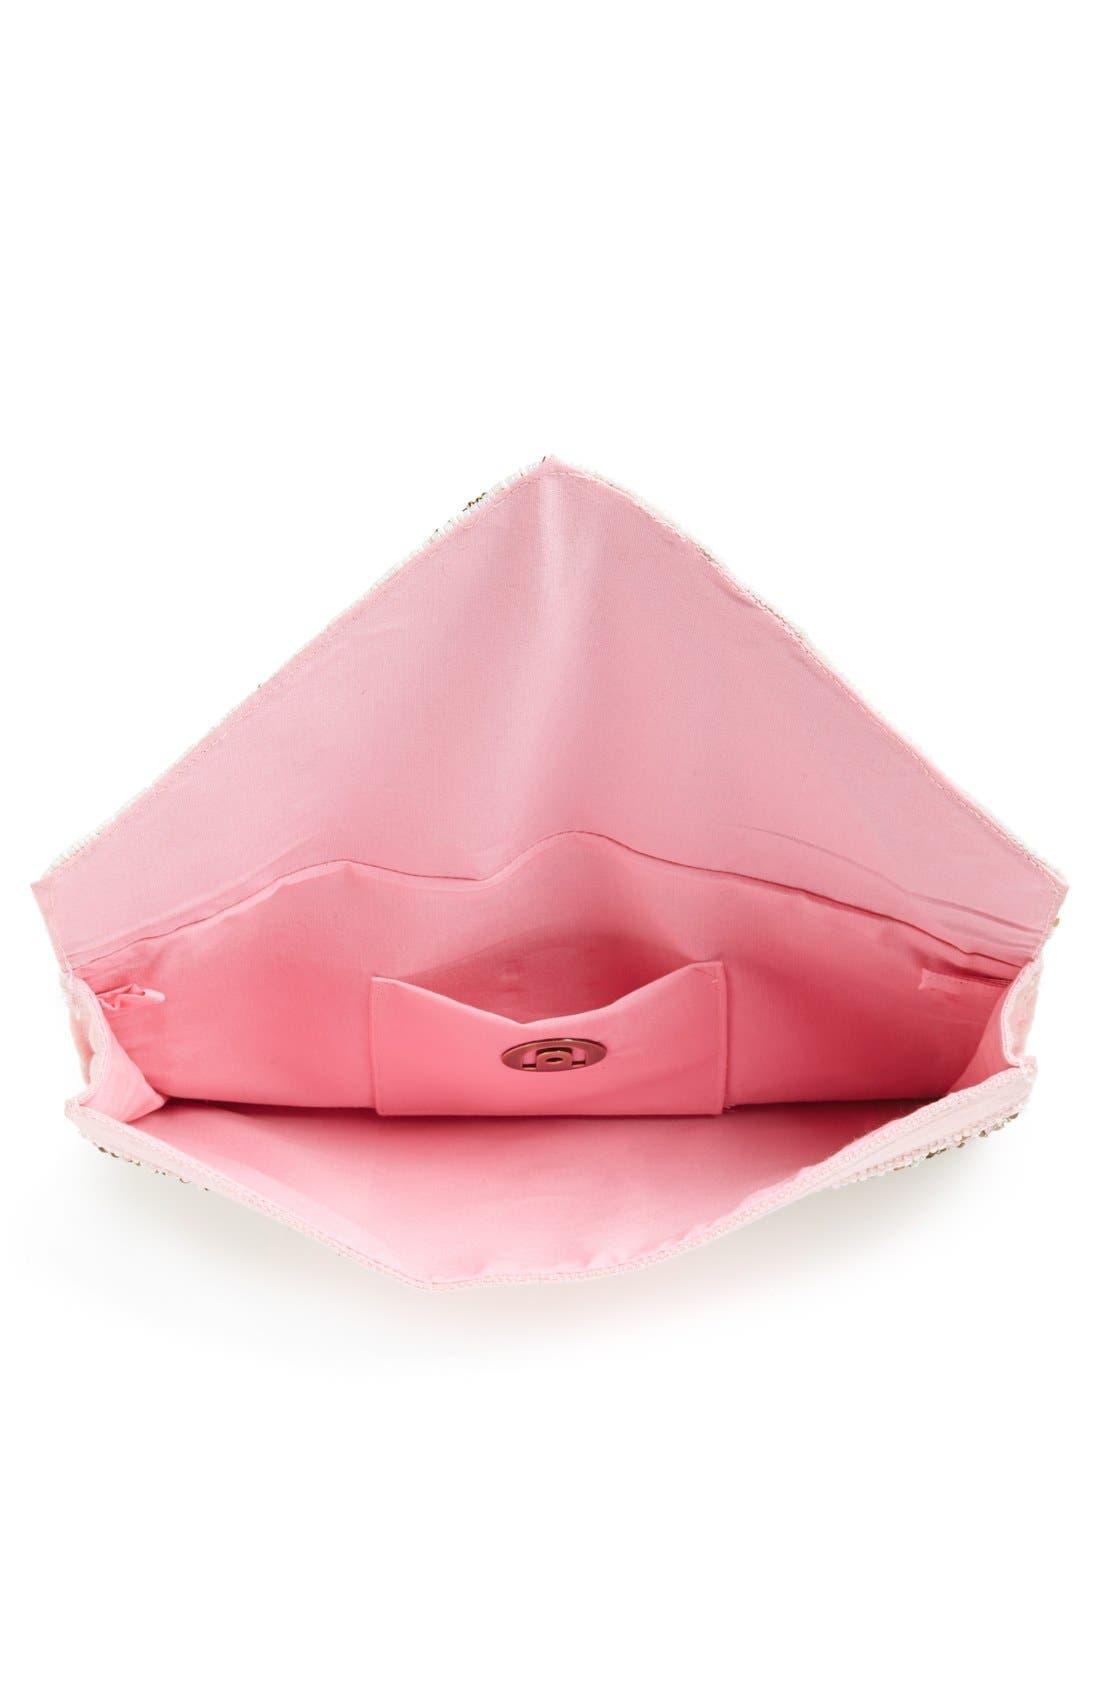 Geo Beaded Envelope Clutch,                             Alternate thumbnail 2, color,                             Pink Multi